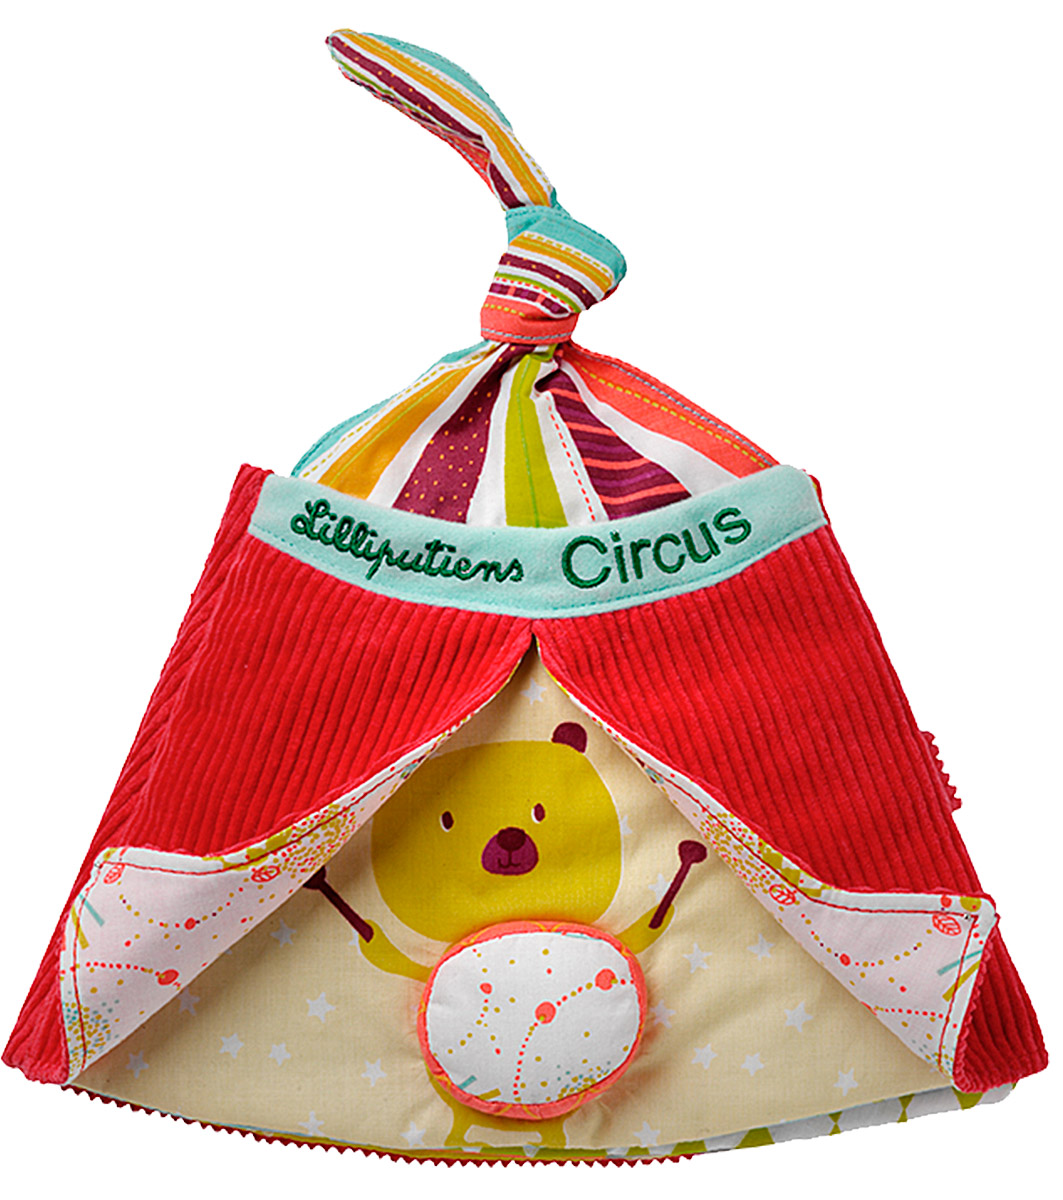 Lilliputiens Мягкая книжка-игрушка Цирк Шапито книжки игрушки lilliputiens цирк шапито мягкая развивающая книжка игрушка